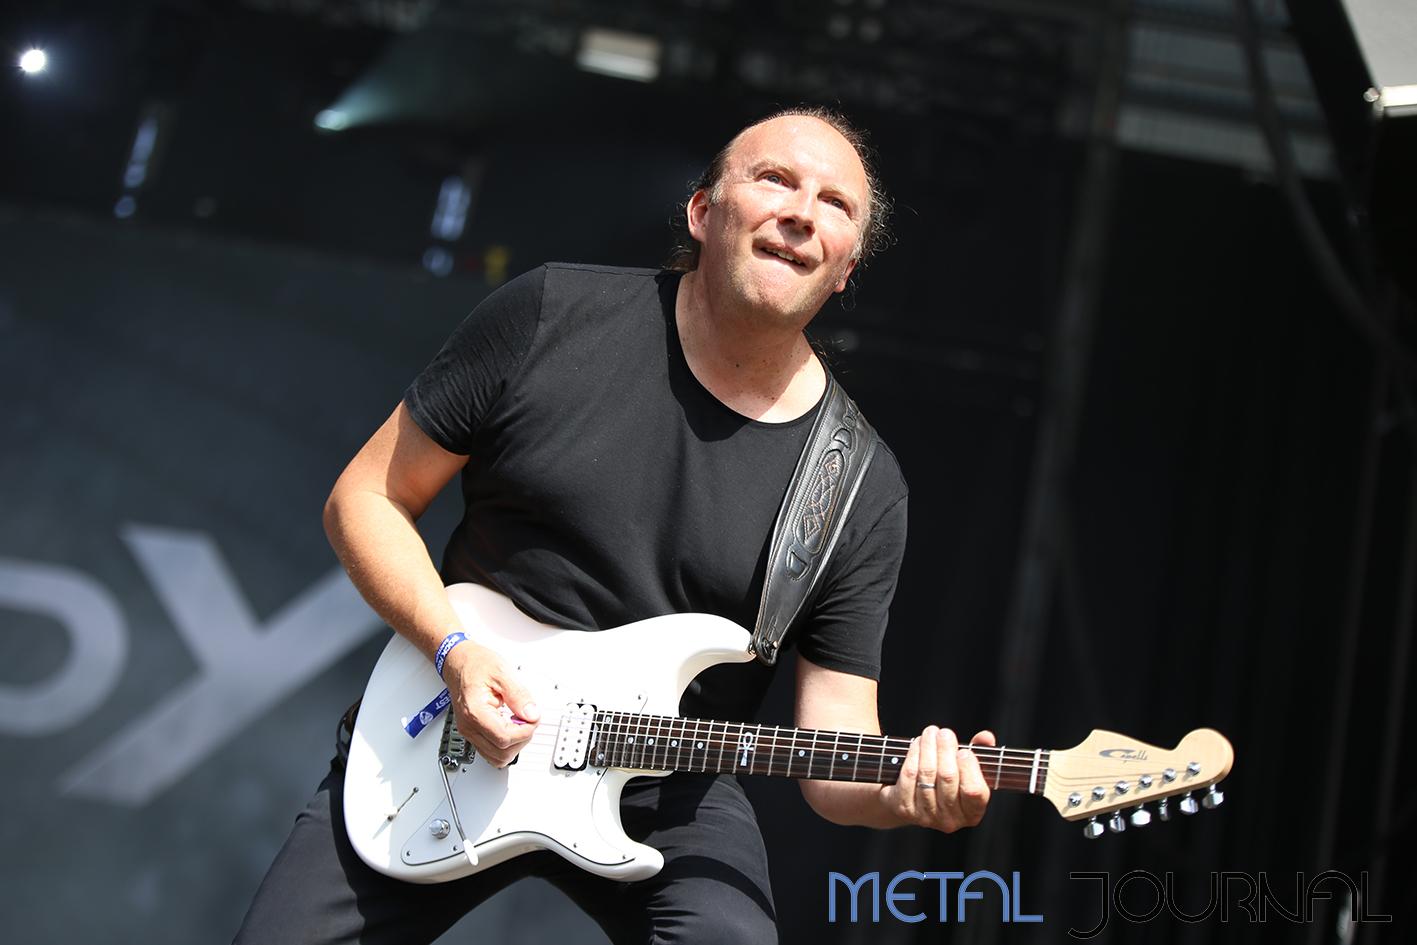 turilli lione rhapsody - metal journal rock fest barcelona 2019 pic 5